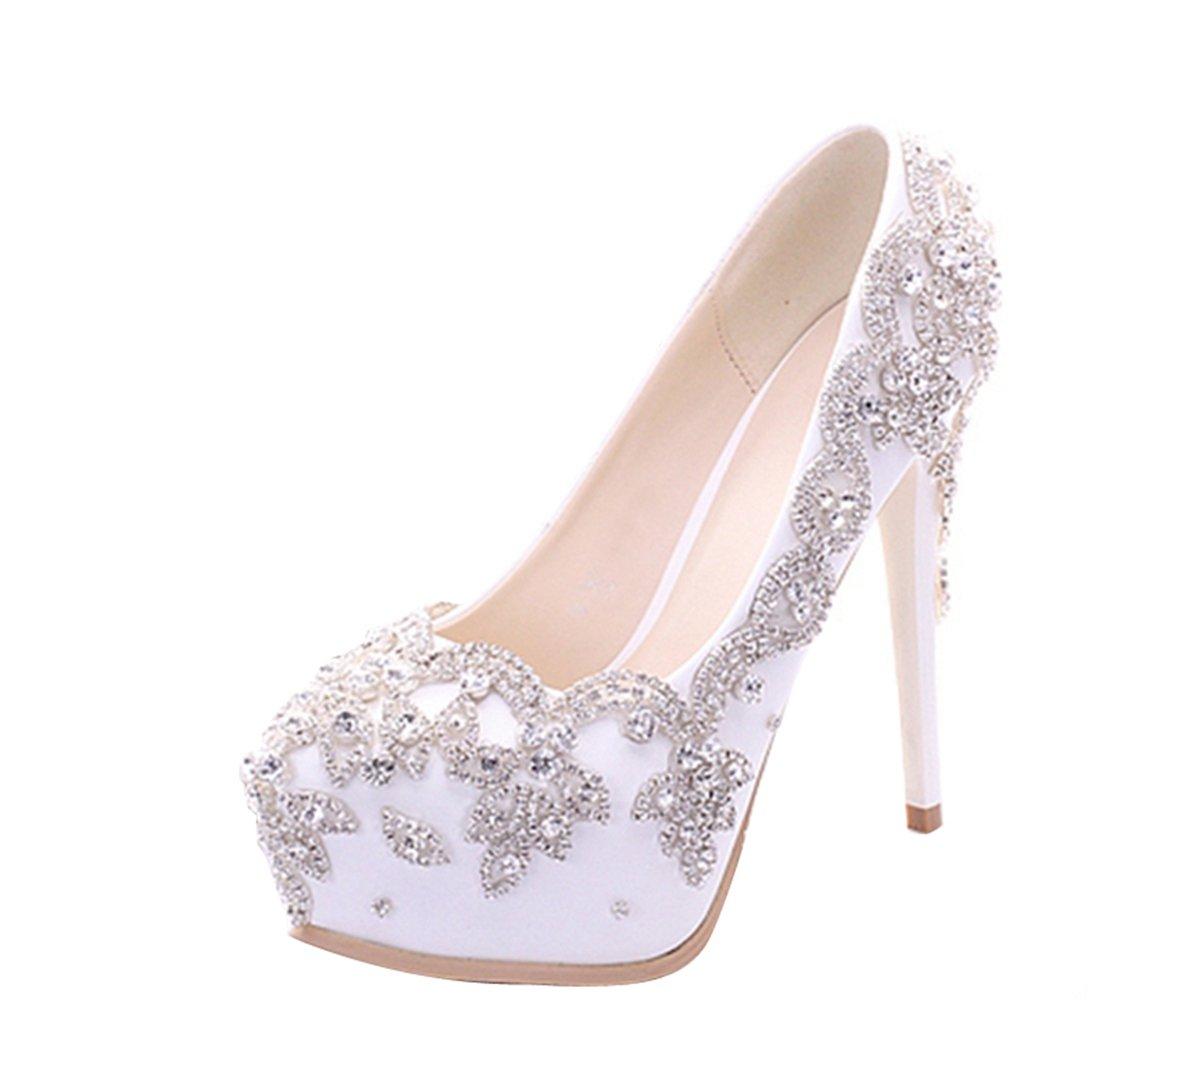 Miyoopark - plataforma mujer 36 2/3 EU White-14cm Heel